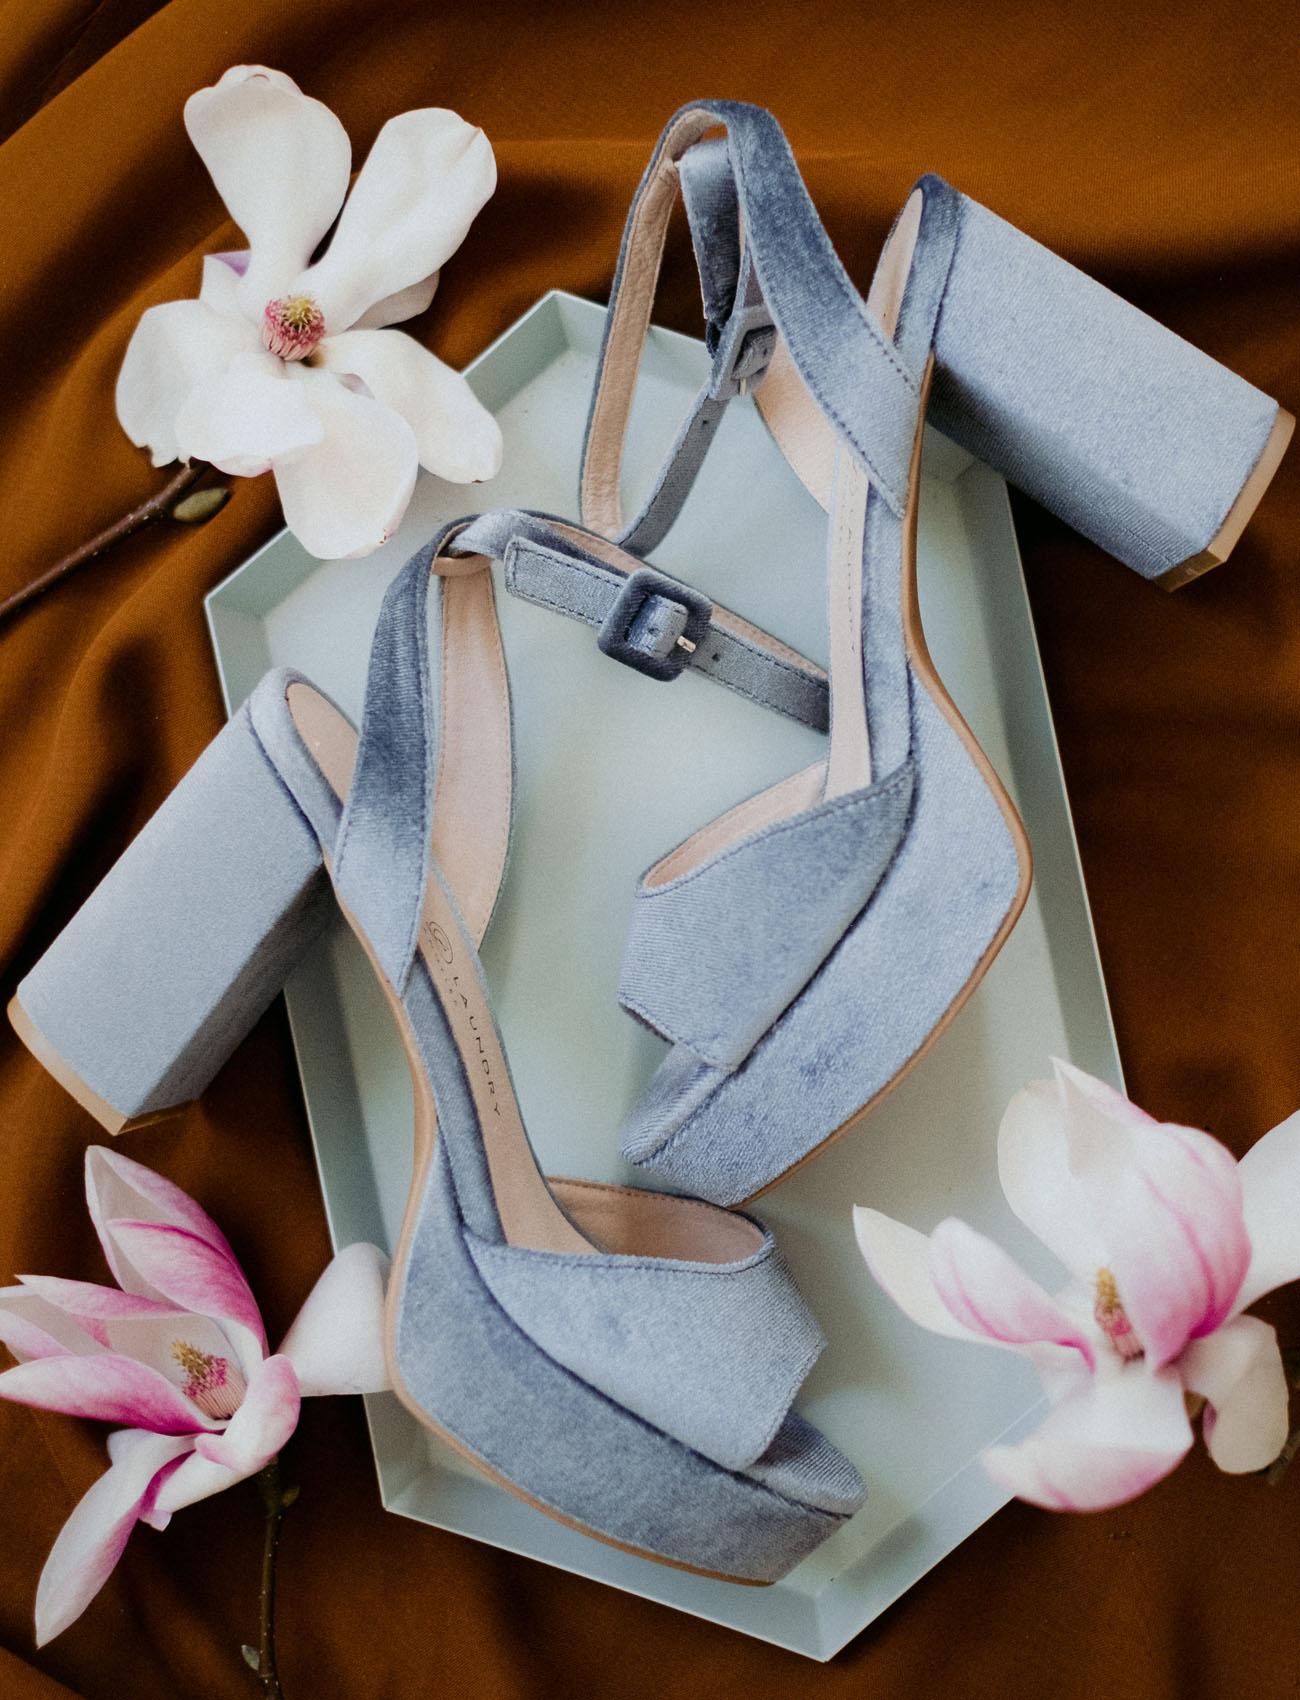 The bridal heels were powder blue ones on a platform